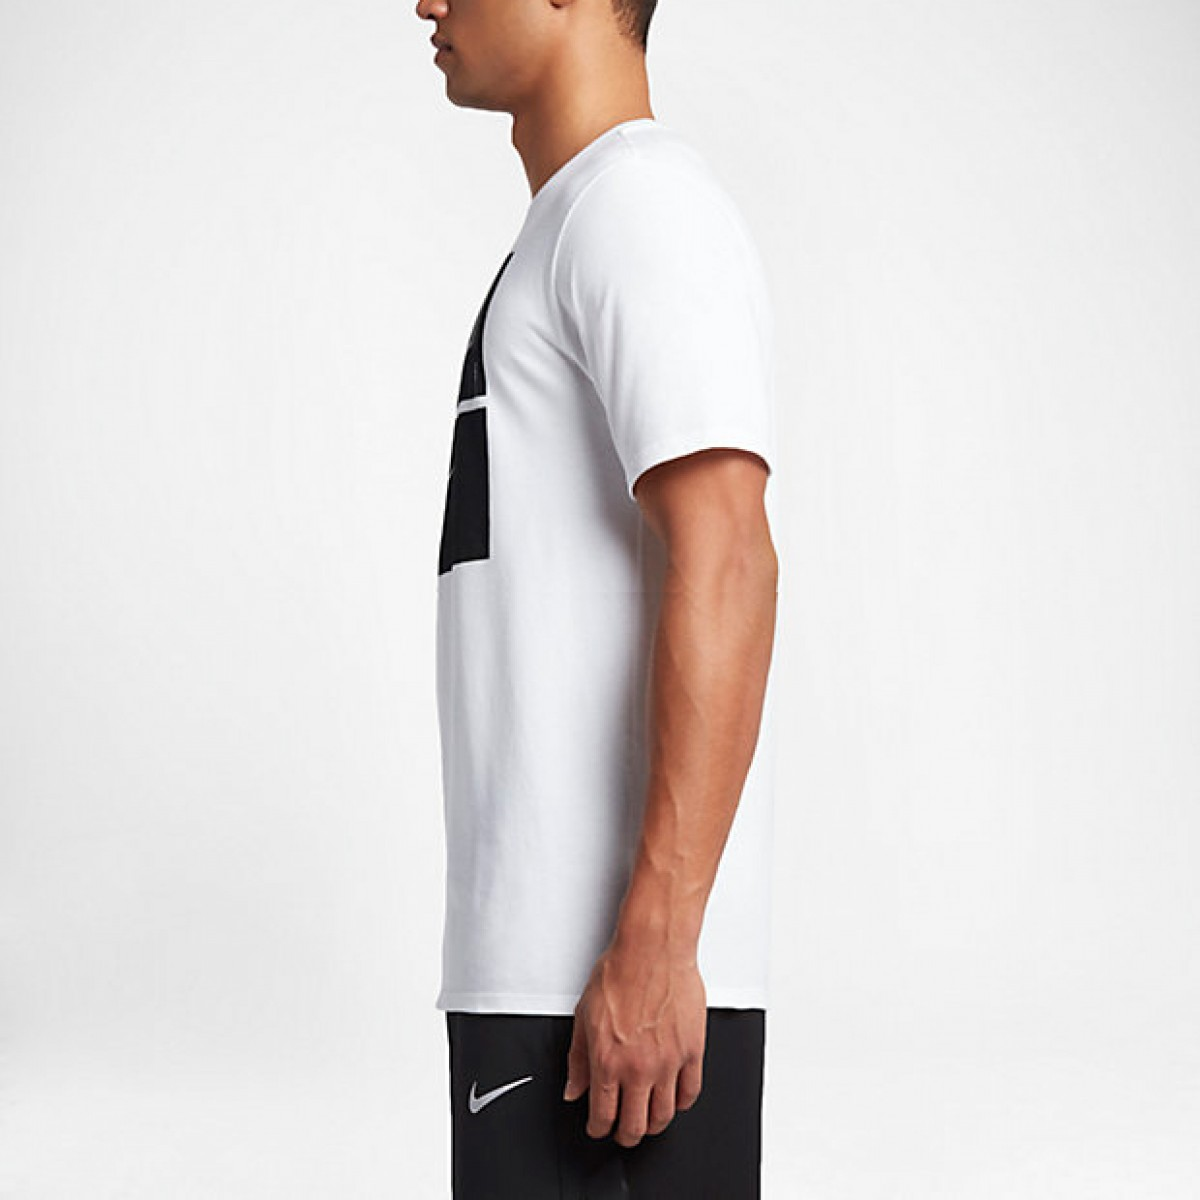 Nike Dry Core Art 1 T-Shirt 'White'